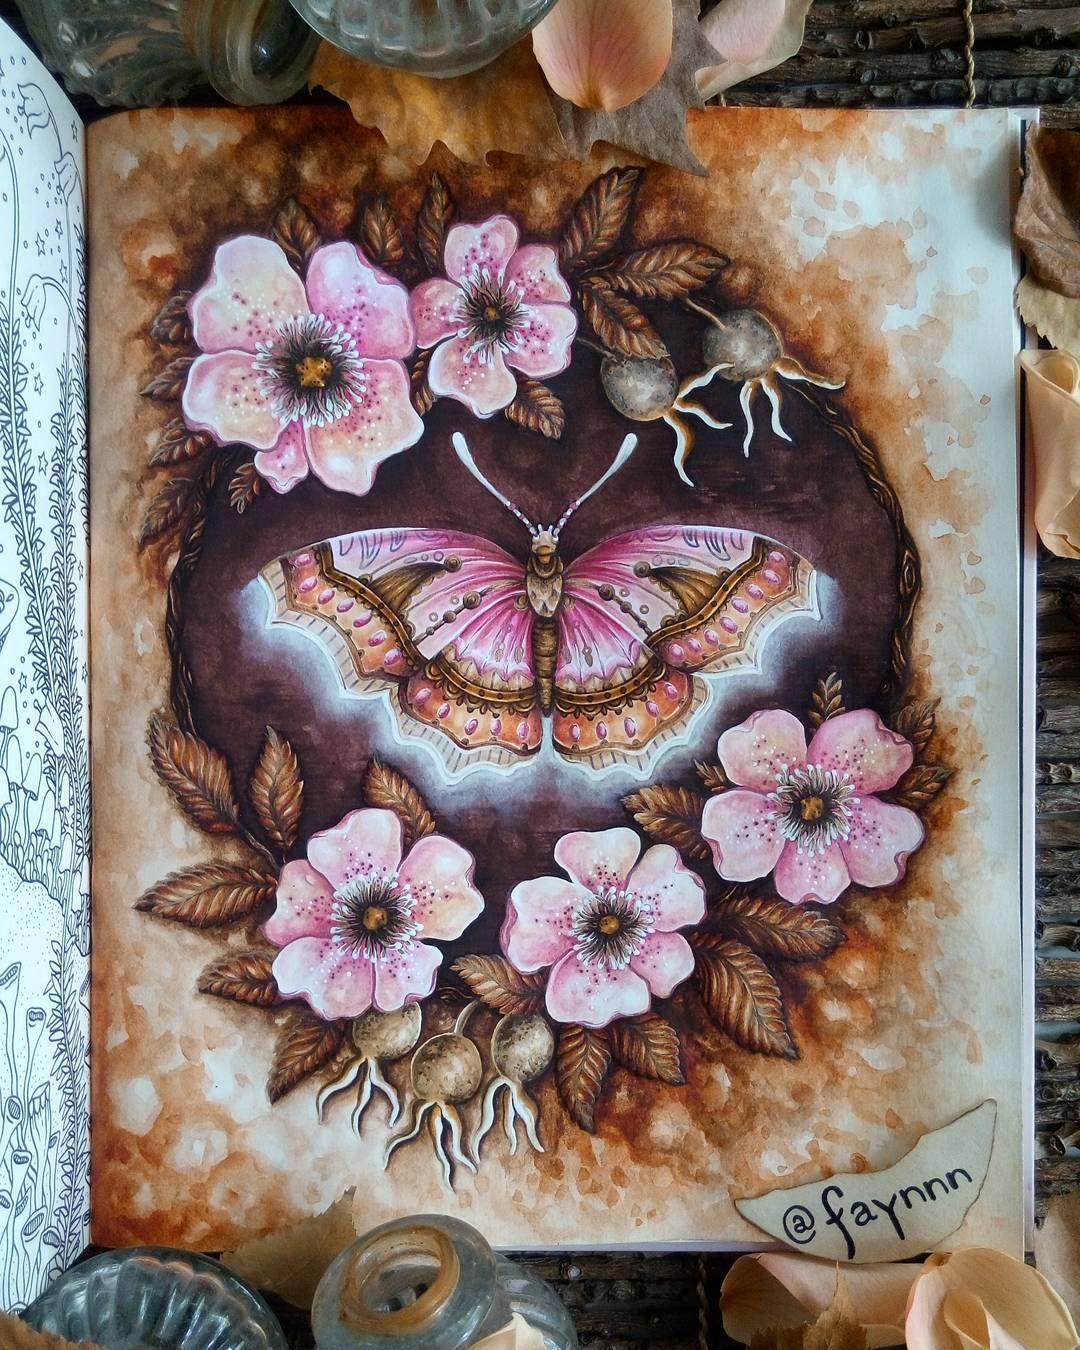 Pin de Maggie Netoperkova en 01_ Summer Nights | Pinterest | Arte